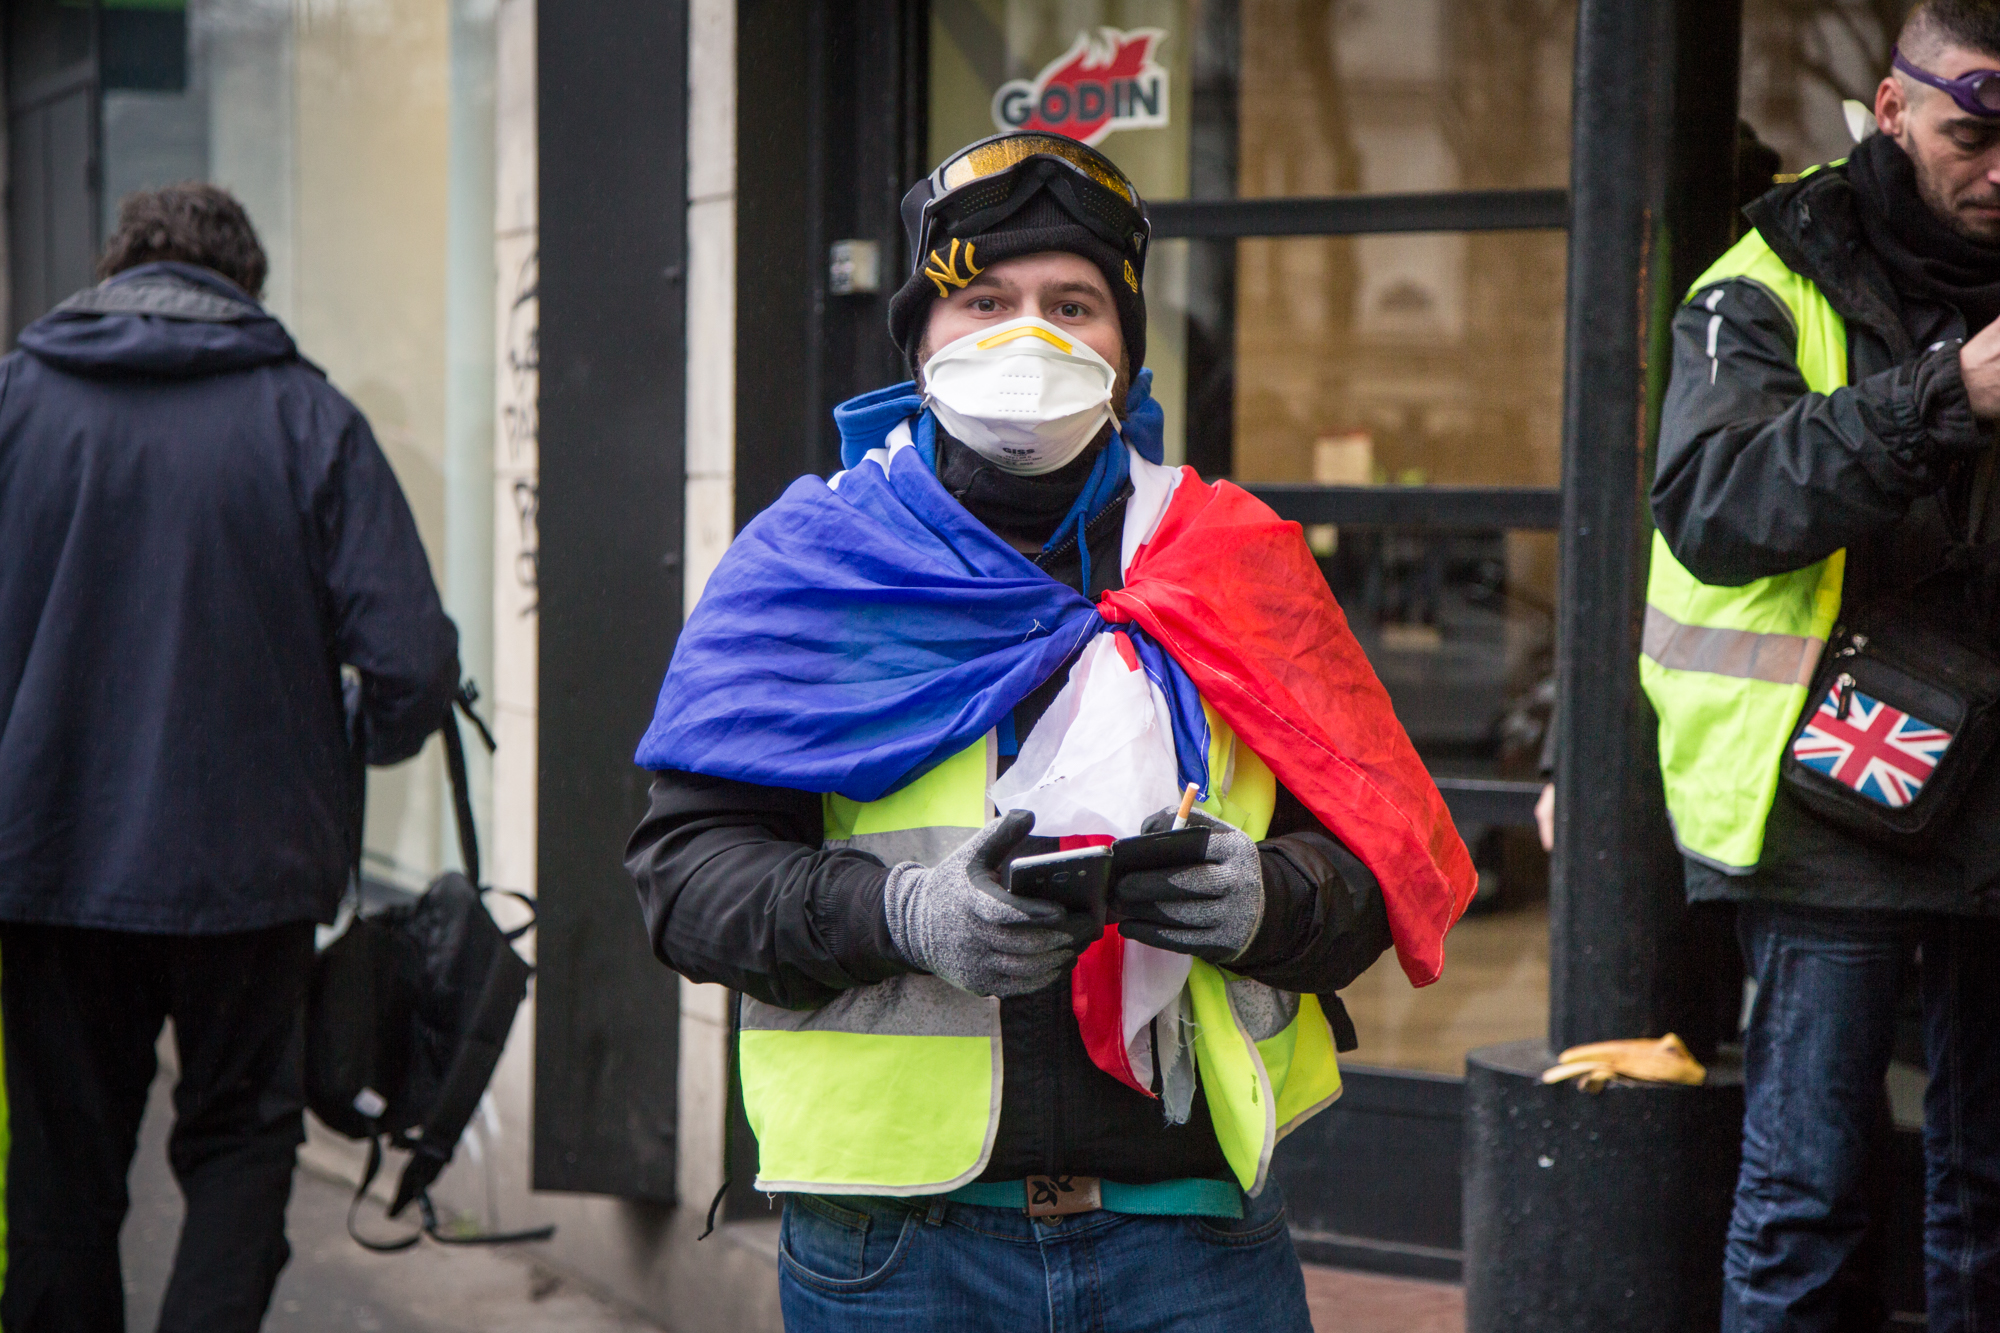 Gilets Jaunes, acte xi, Paris, 26/01/19